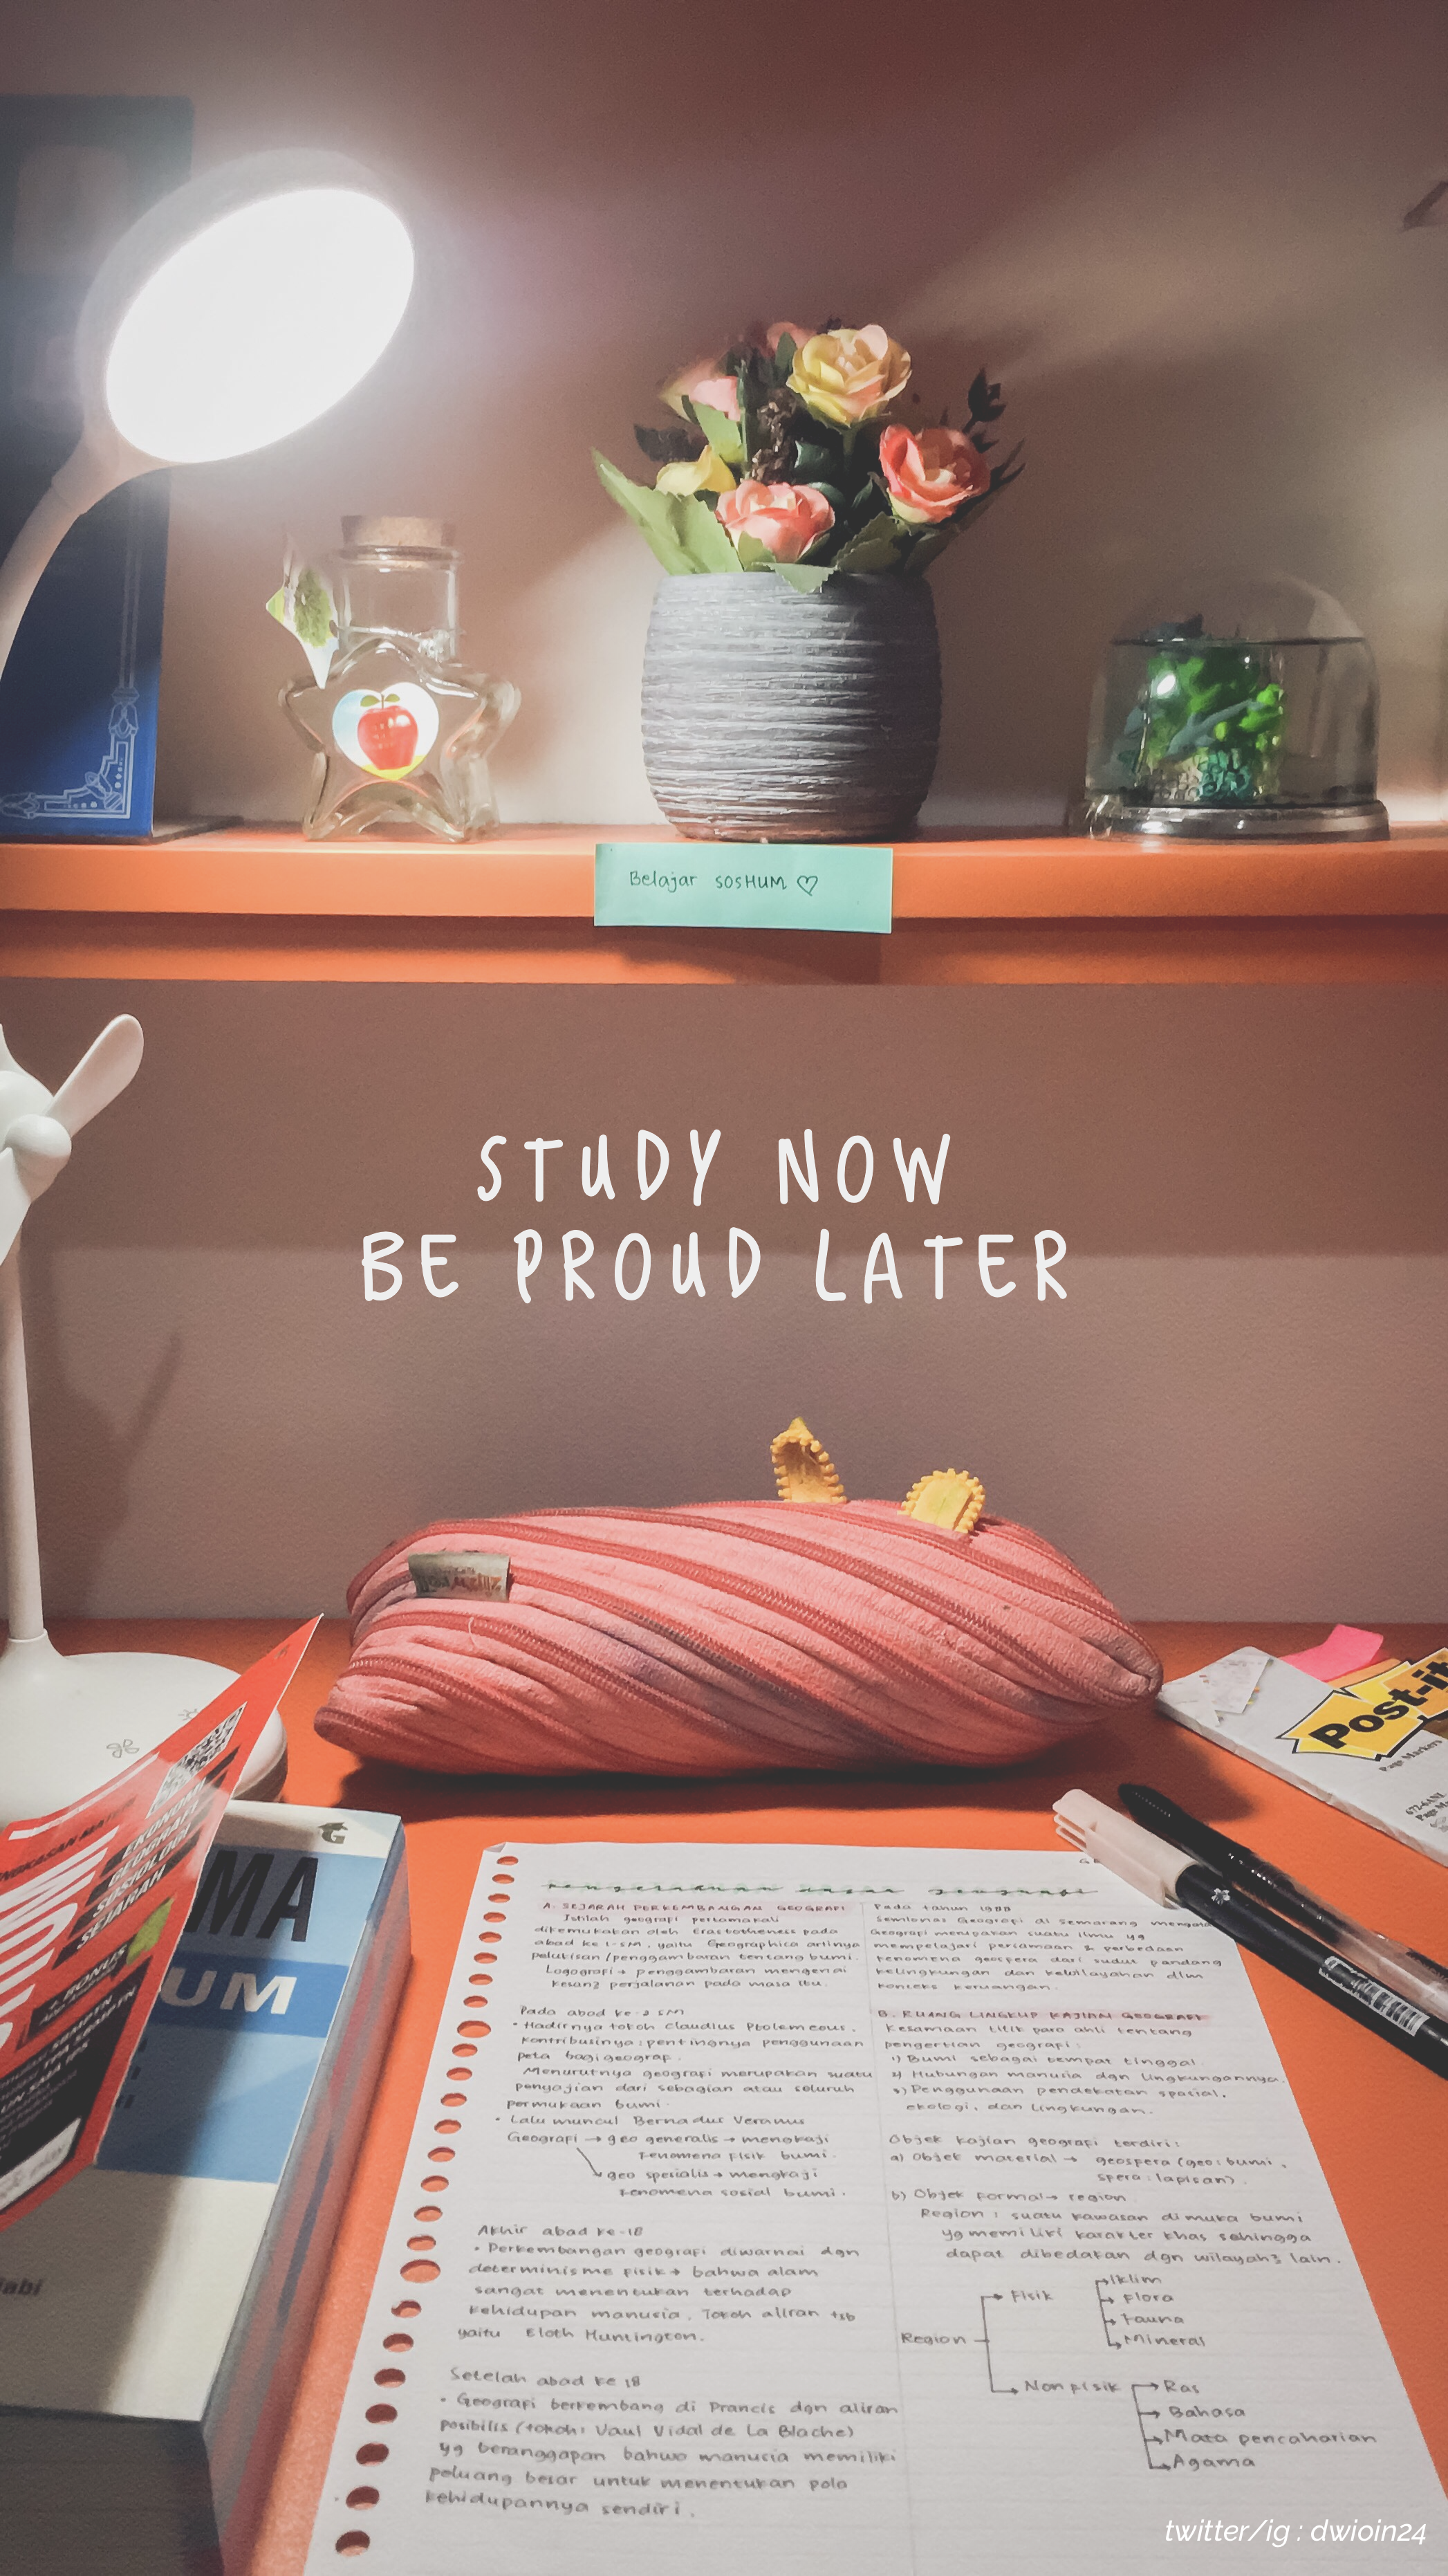 hi follow me on instagram twitter dwioin study studygram